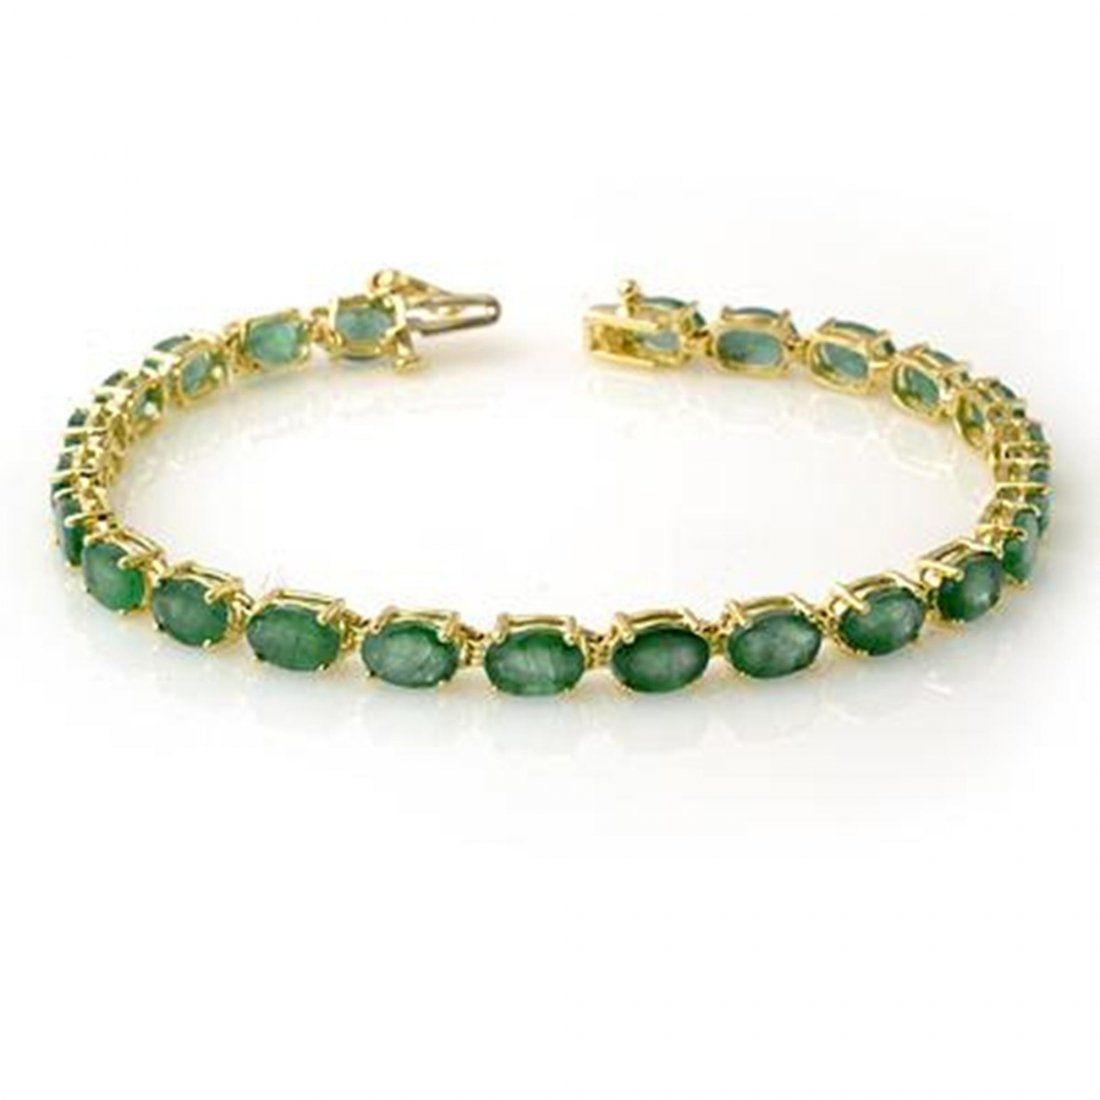 Genuine 14 ctw Emerald Bracelet 10K Yellow Gold